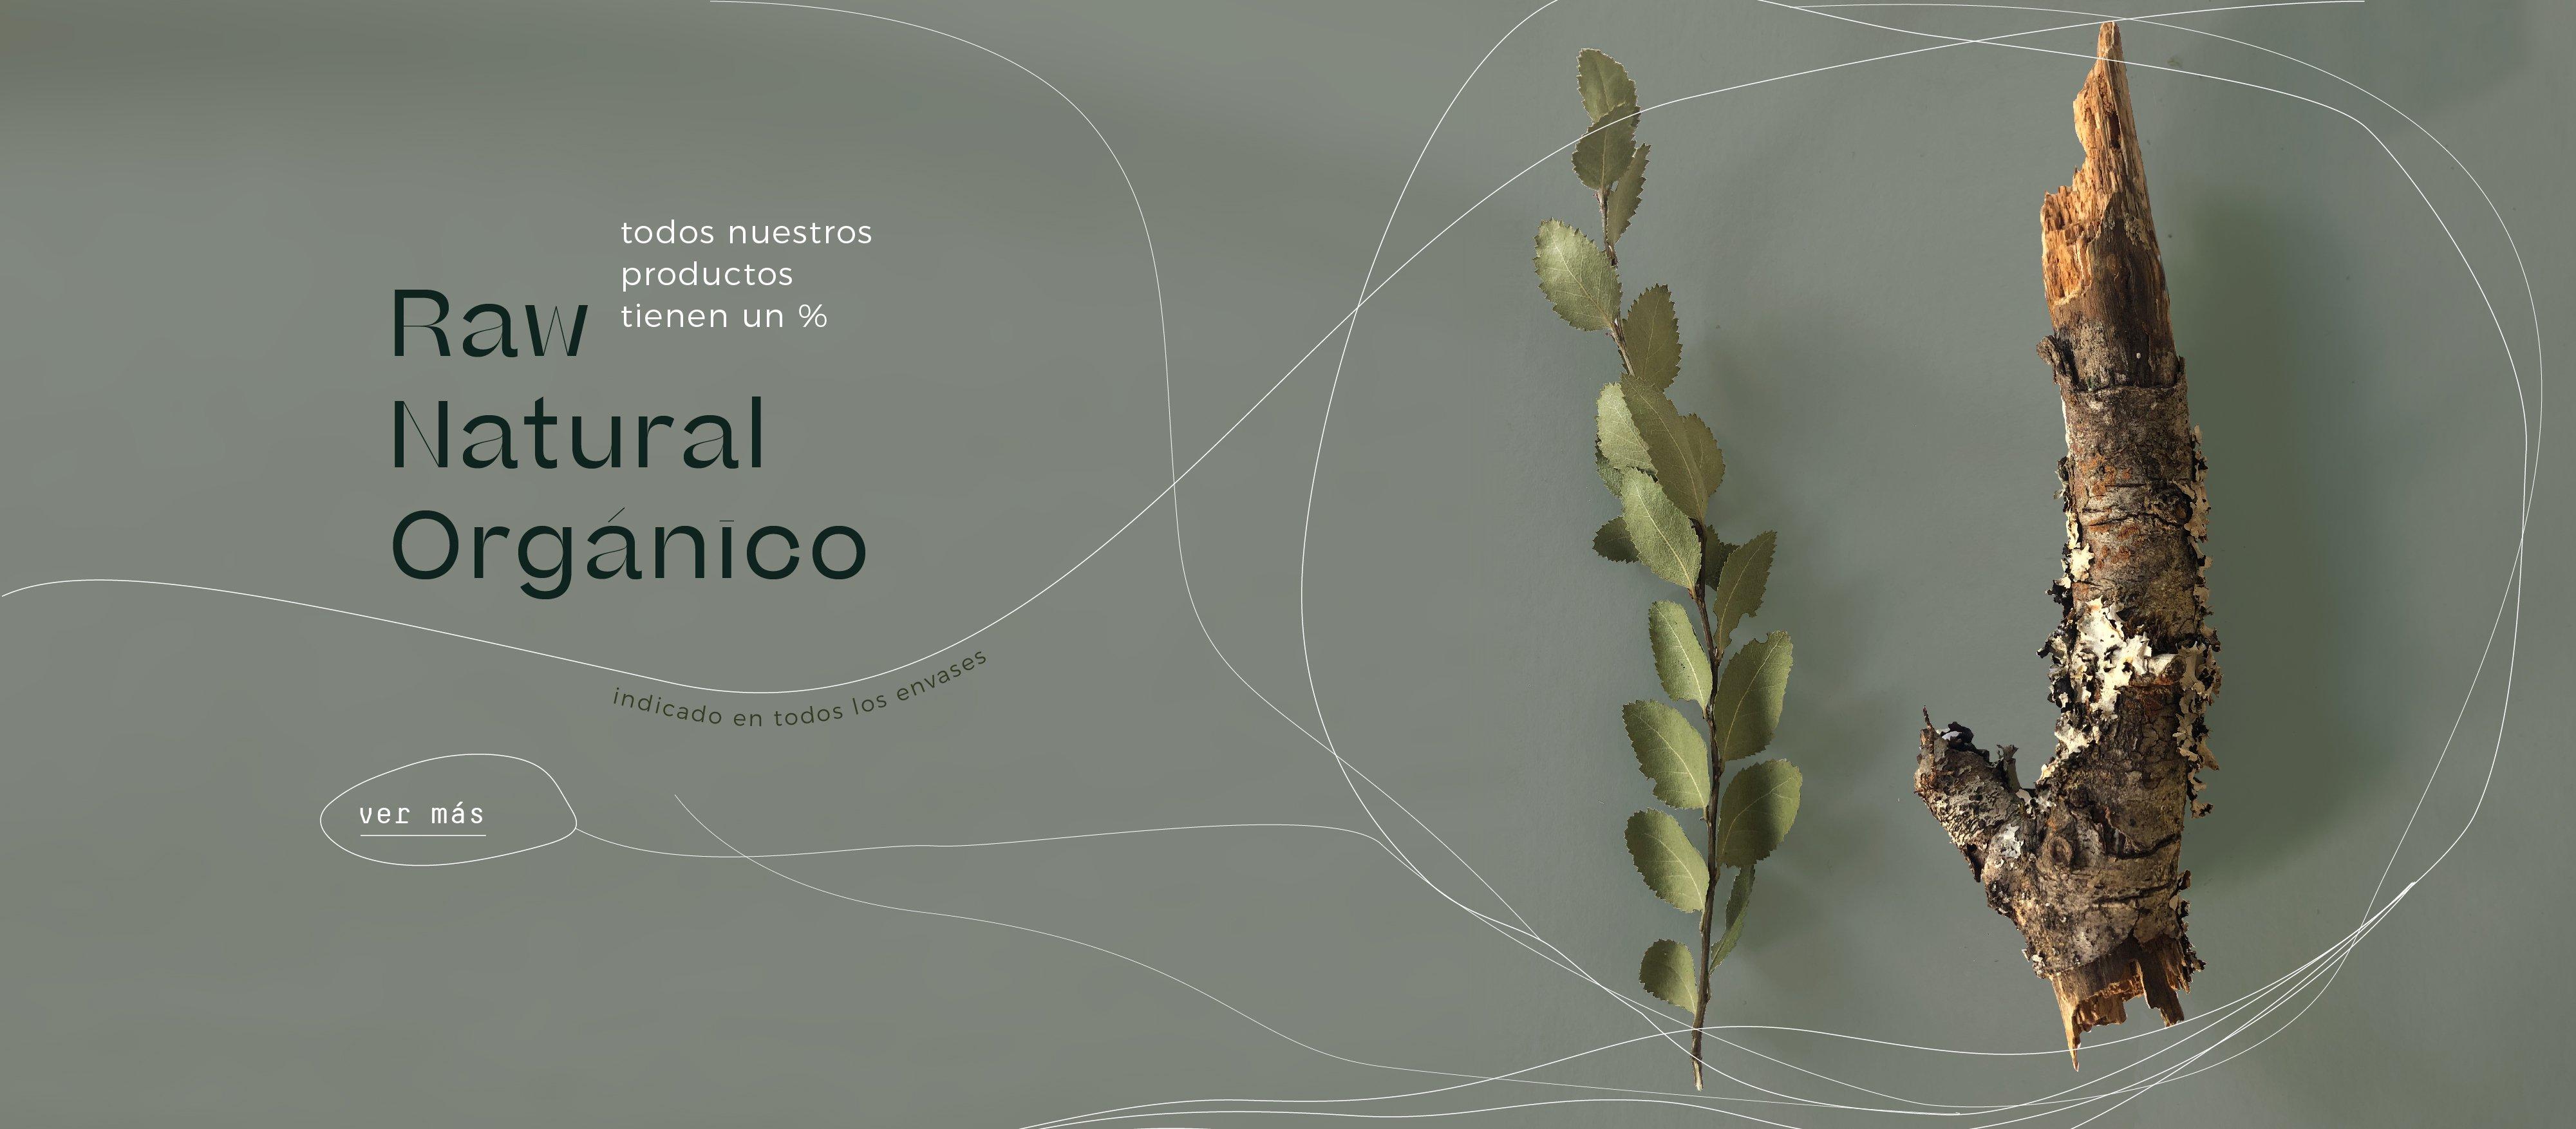 01_Raw-Natural-Organico_Mesa_de_trabajo_1_copia01_Raw-Natural-Organico_Mesa_de_trabajo_1_copia.jpg